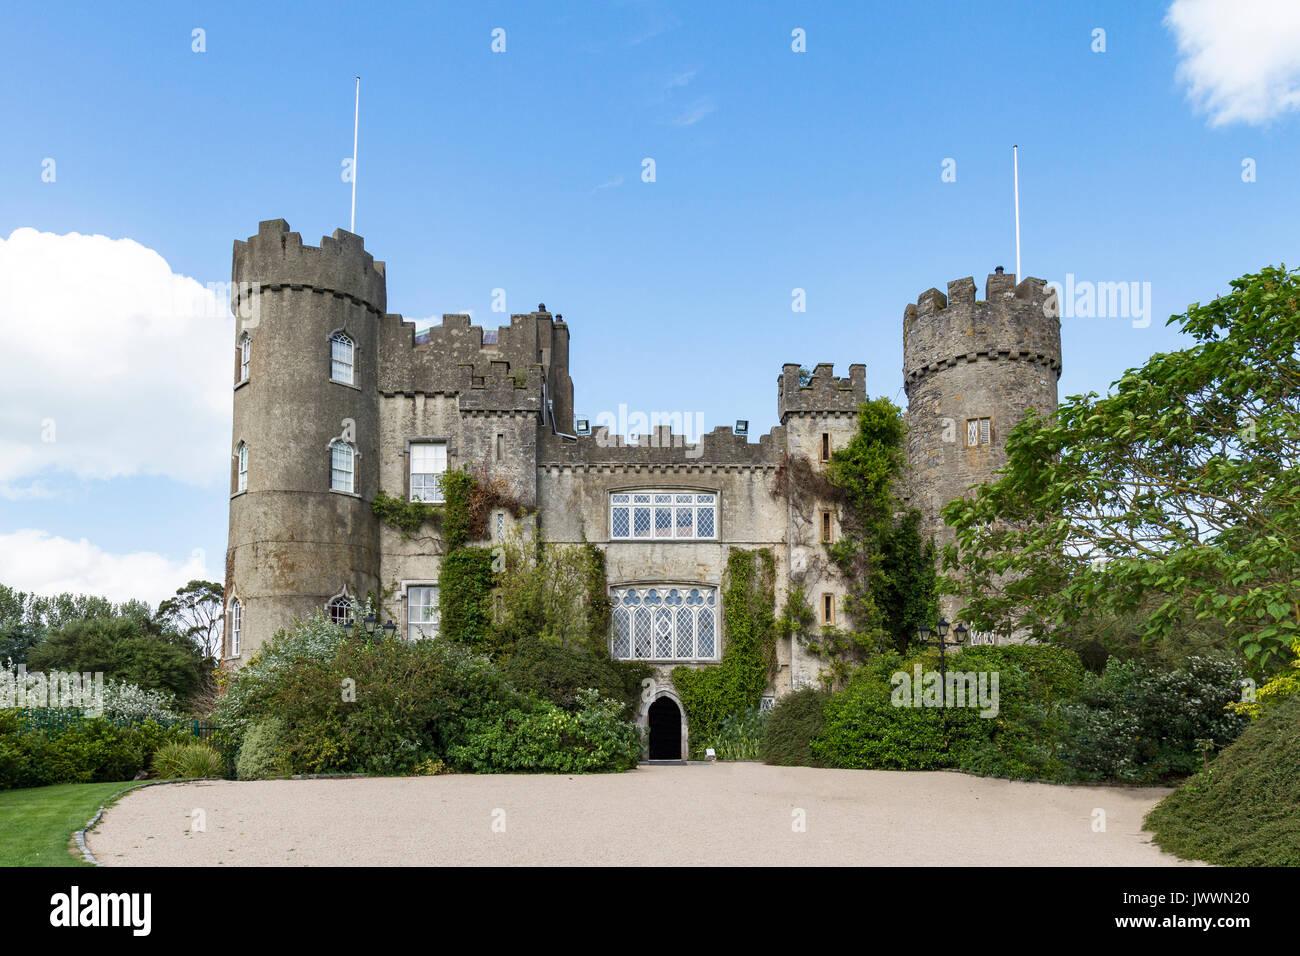 Front entrance of Malahide Castle - Stock Image